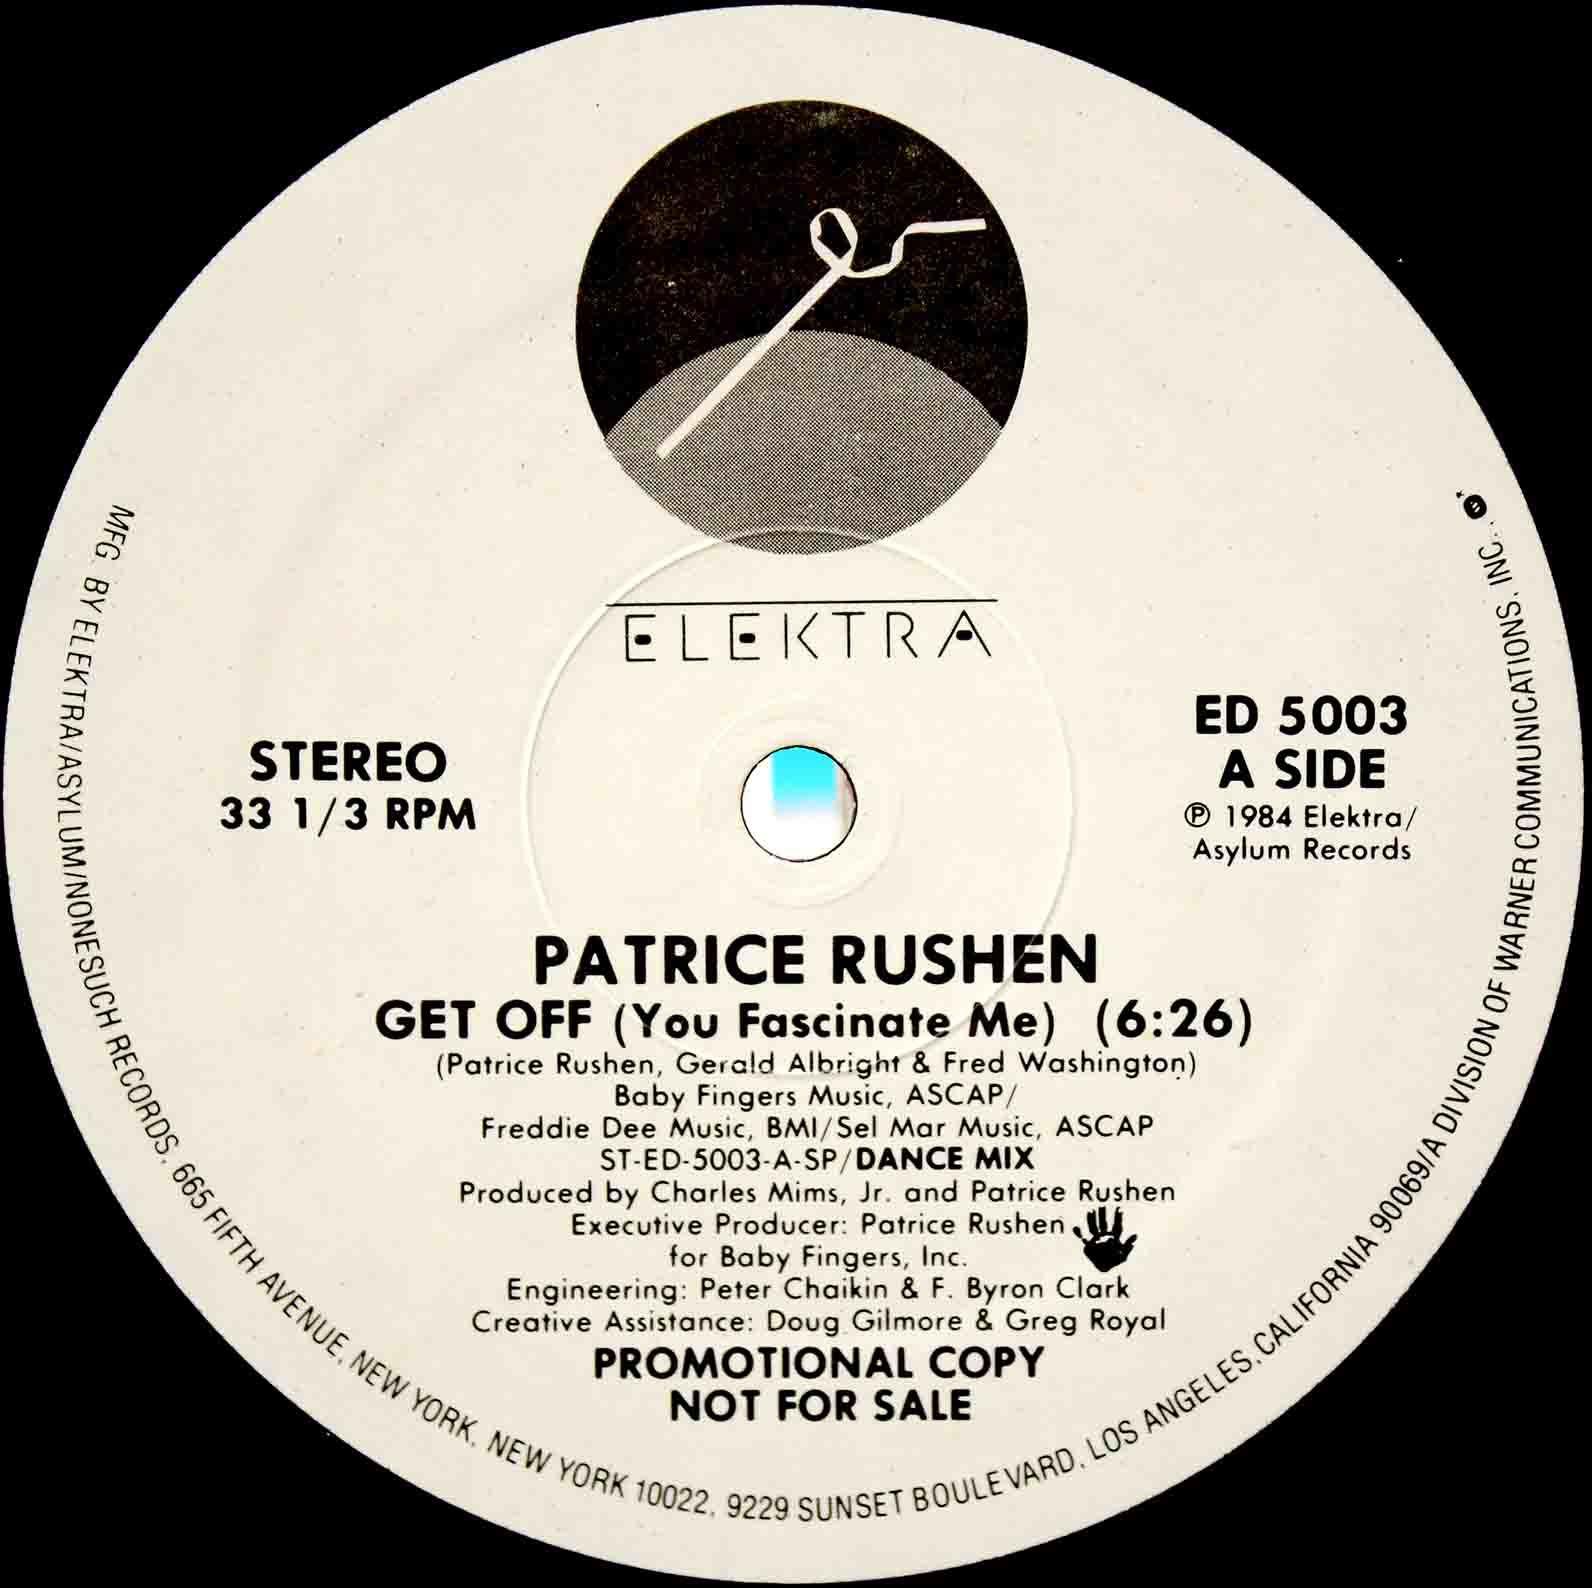 Patrice Rushen – Get Off 03